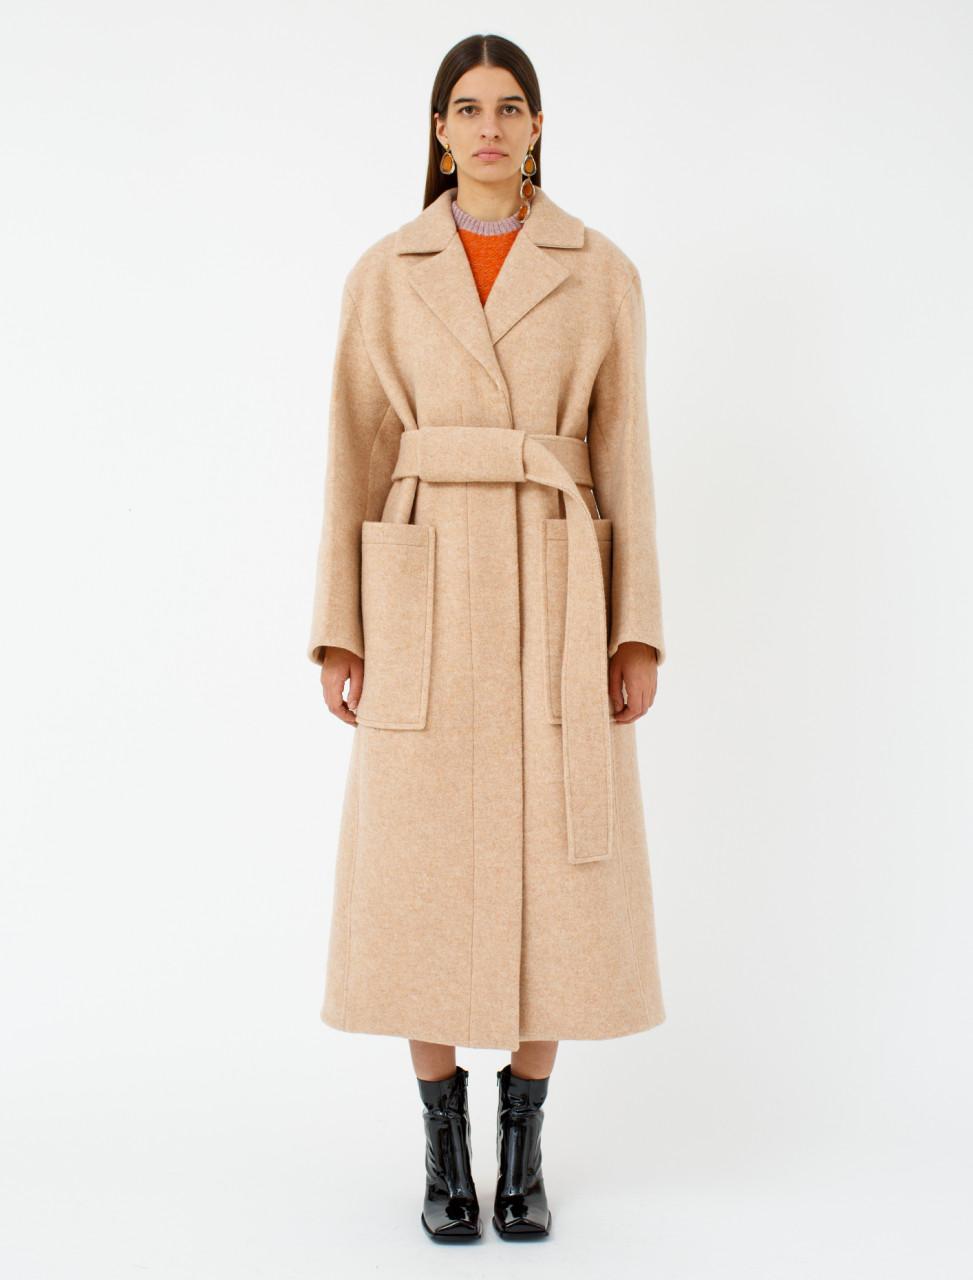 Wool Coat in Beige